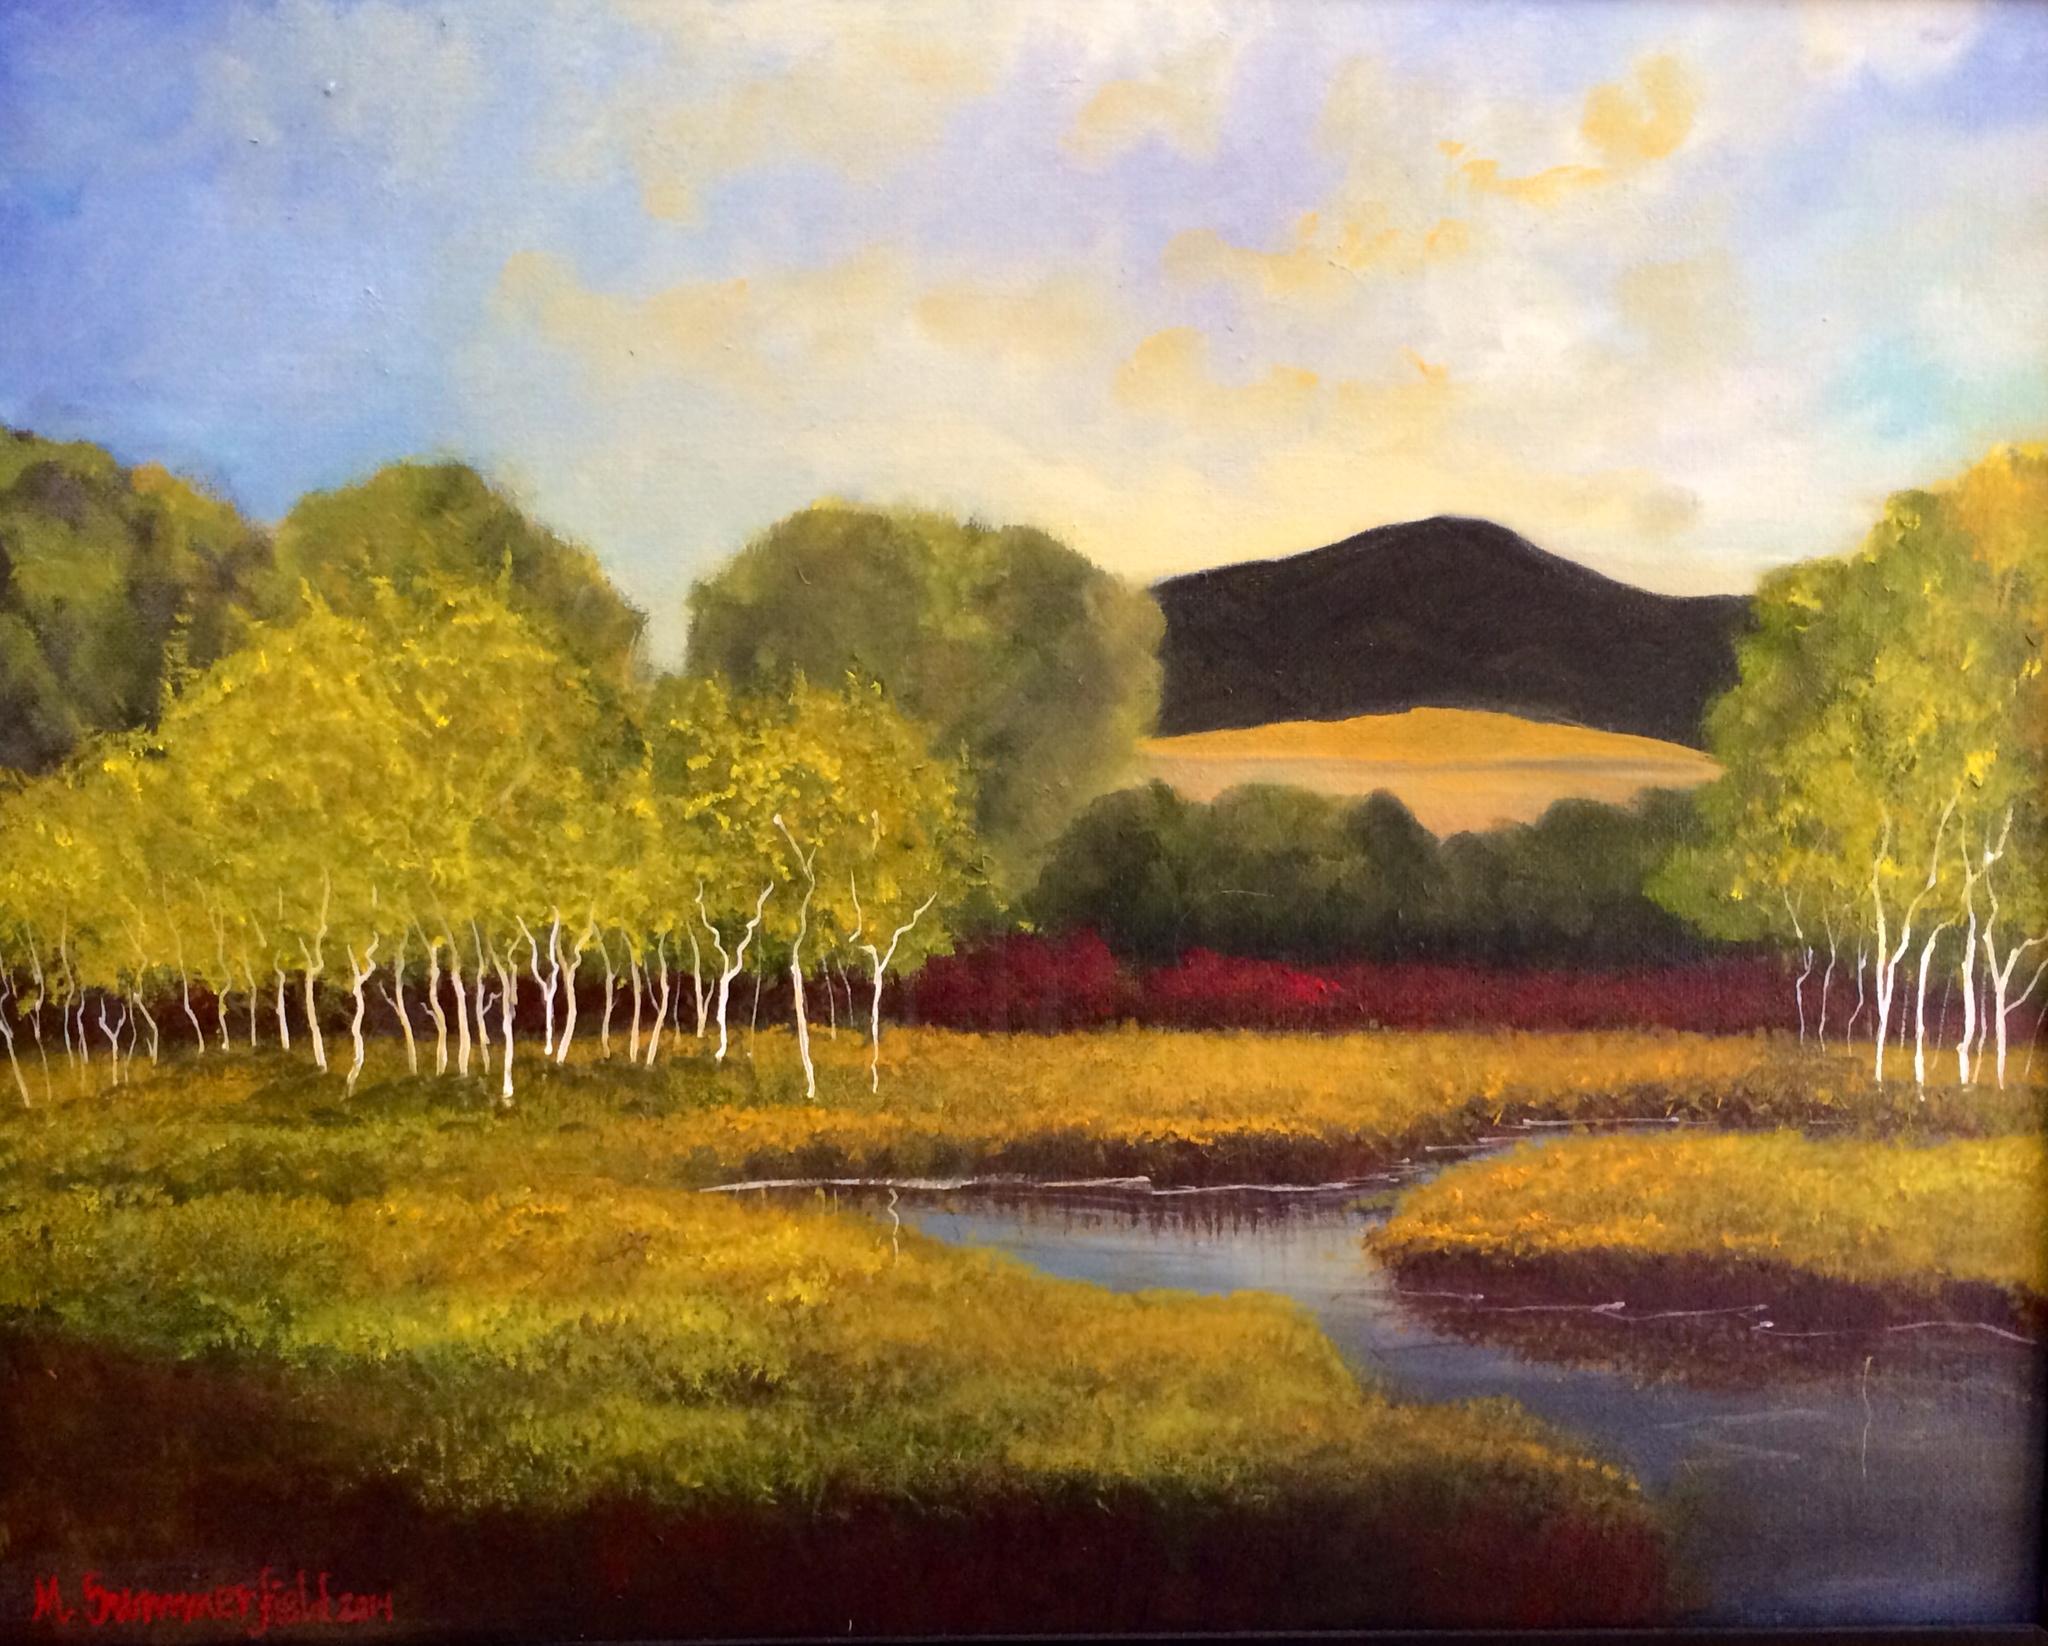 Autumn on the East Gallatin 16x20 2014 Reach Inc. Have a Heart Art Auction Donation 2015